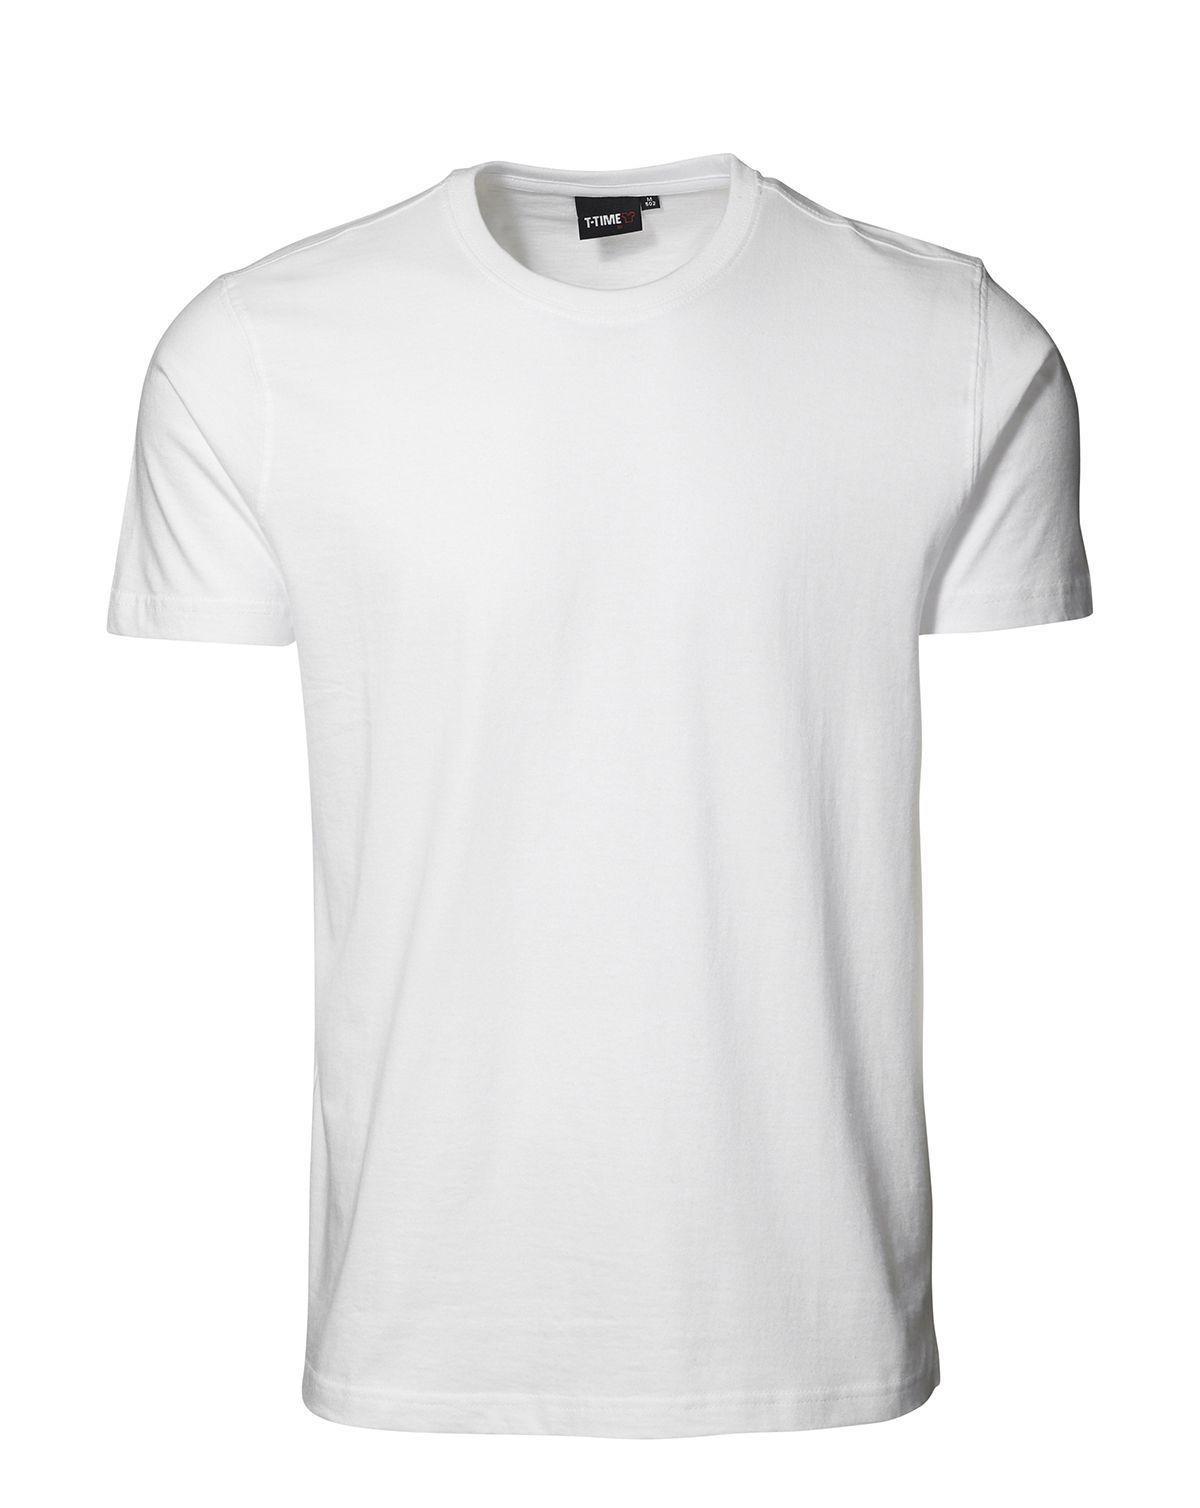 ID T-shirt, Sporty-Fit (Hvid, M)